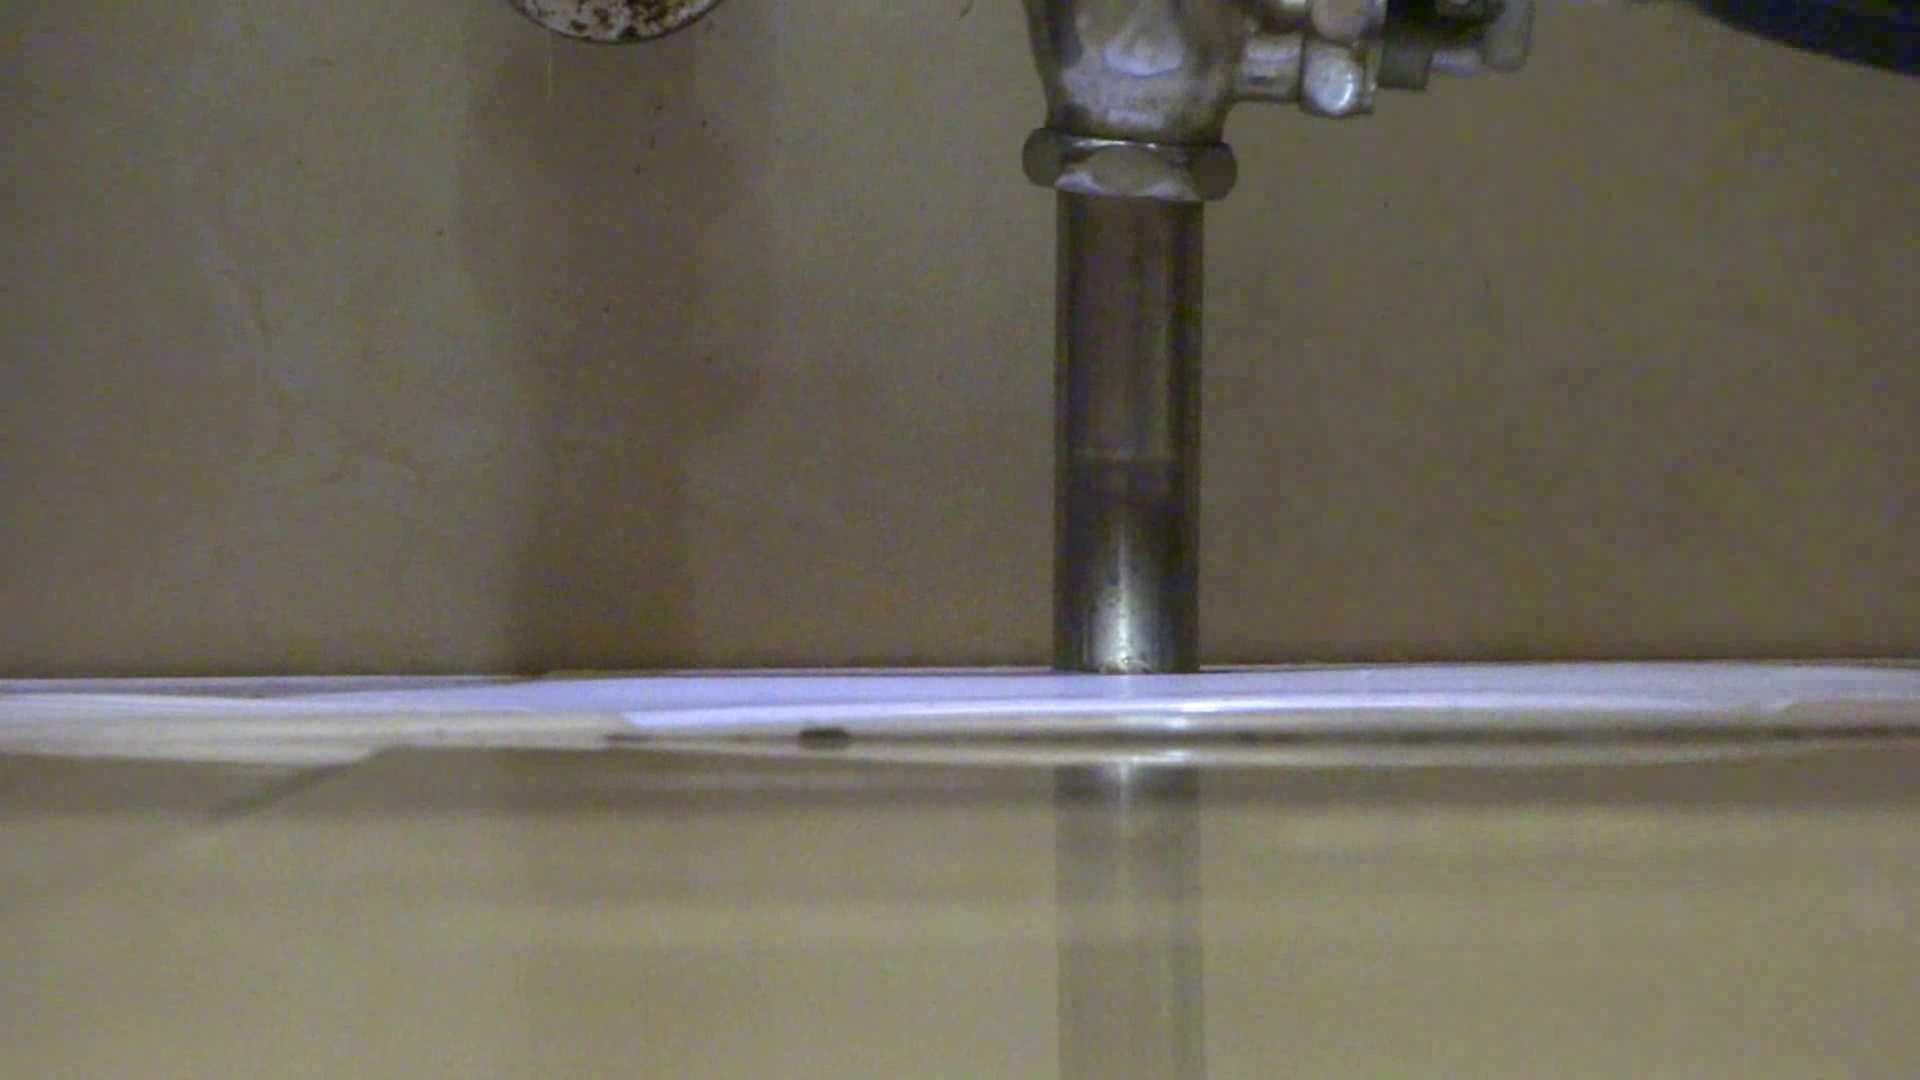 隣国化粧室下から御免!! No.15 洗面所 | 美女H映像  103画像 102